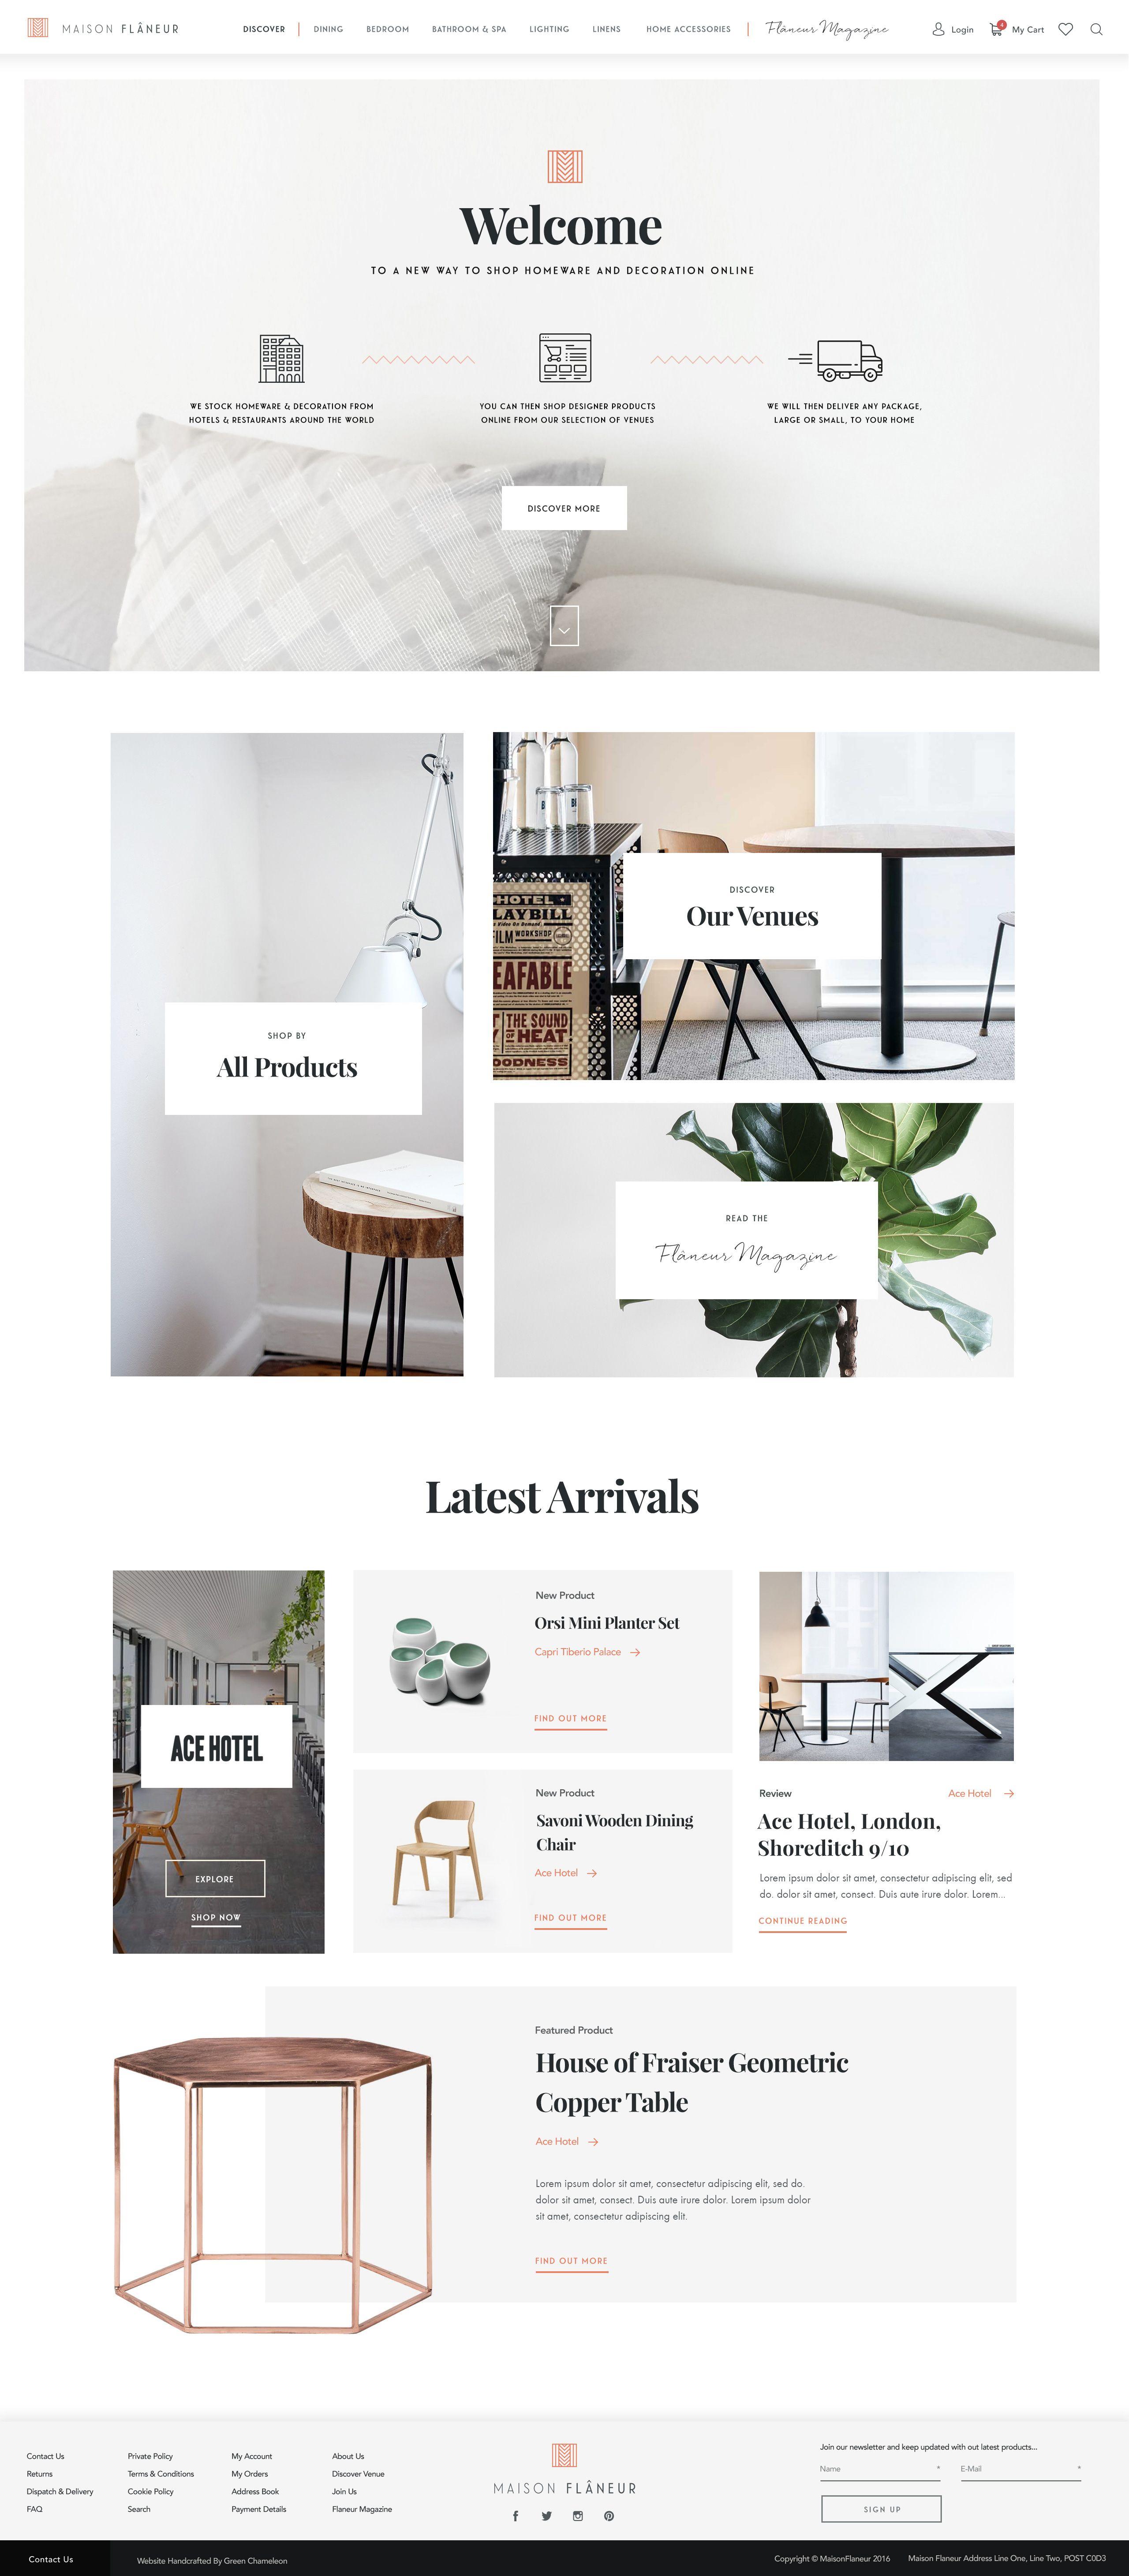 Icon Shot X Light Maison Flaneur Homepage Website Design